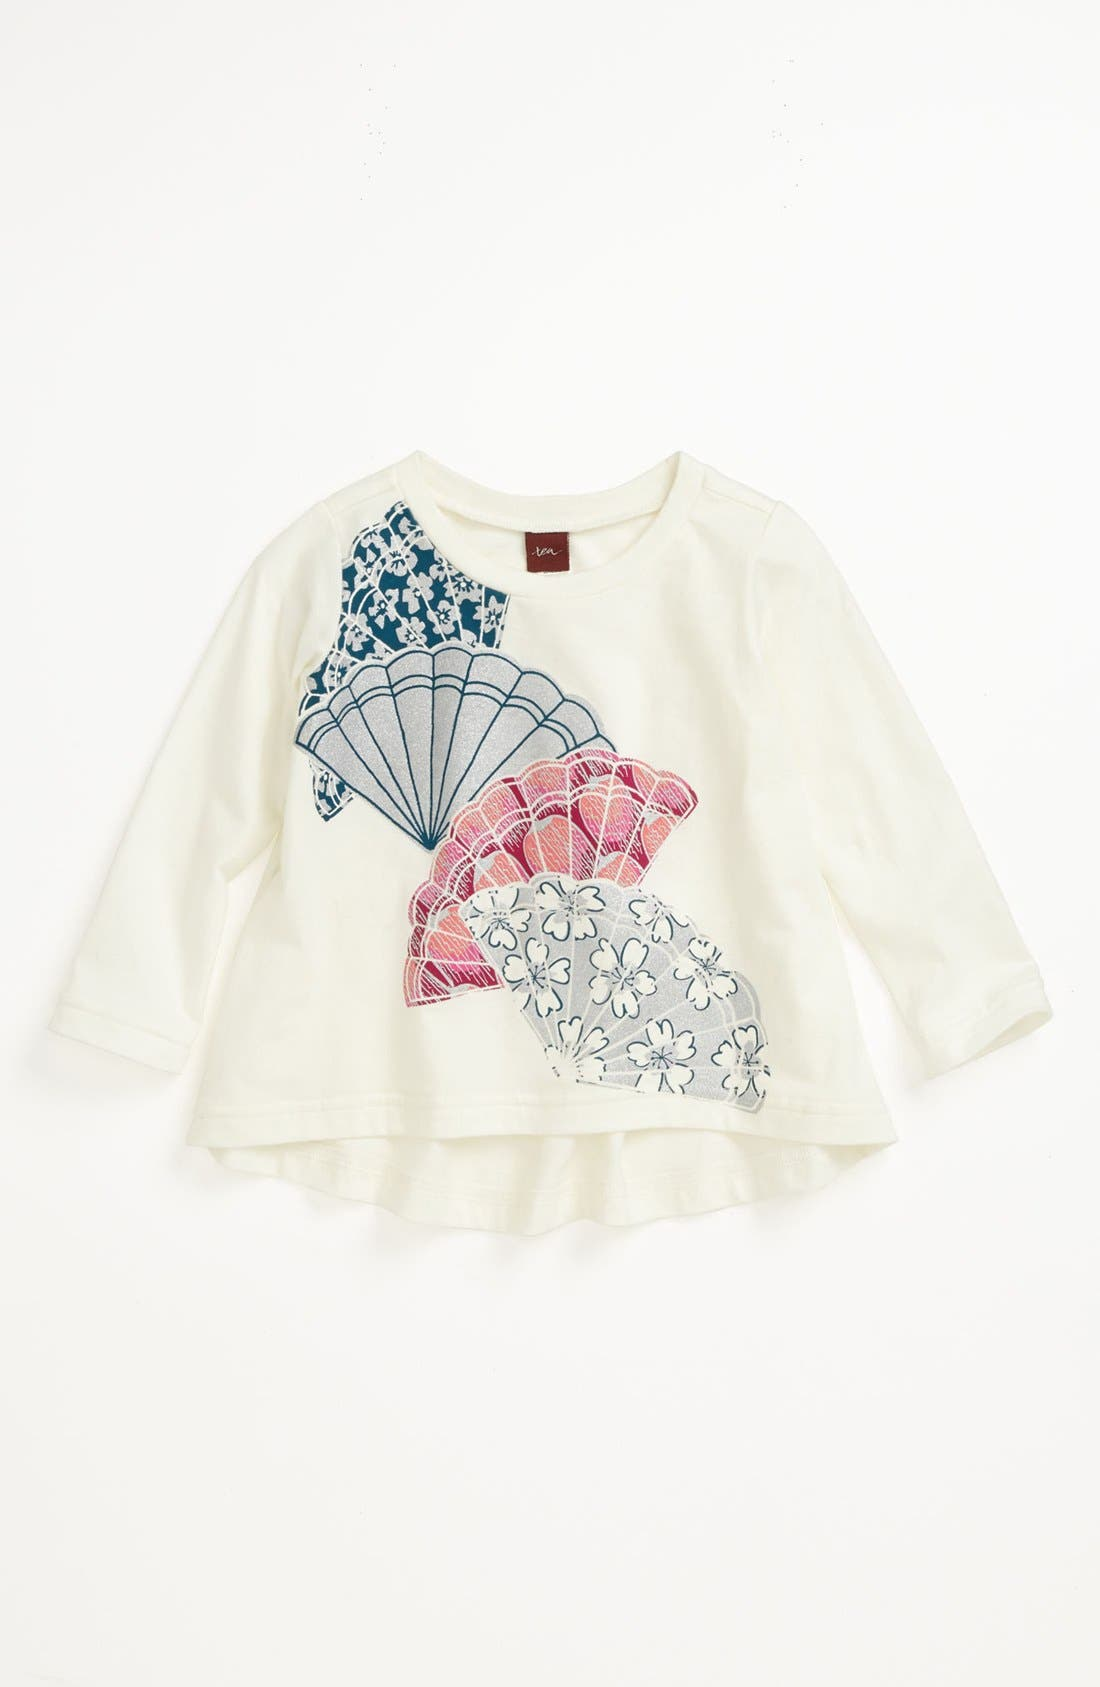 Main Image - Tea Collection 'Fans' Top (Toddler Girls, Little Girls & Big Girls)